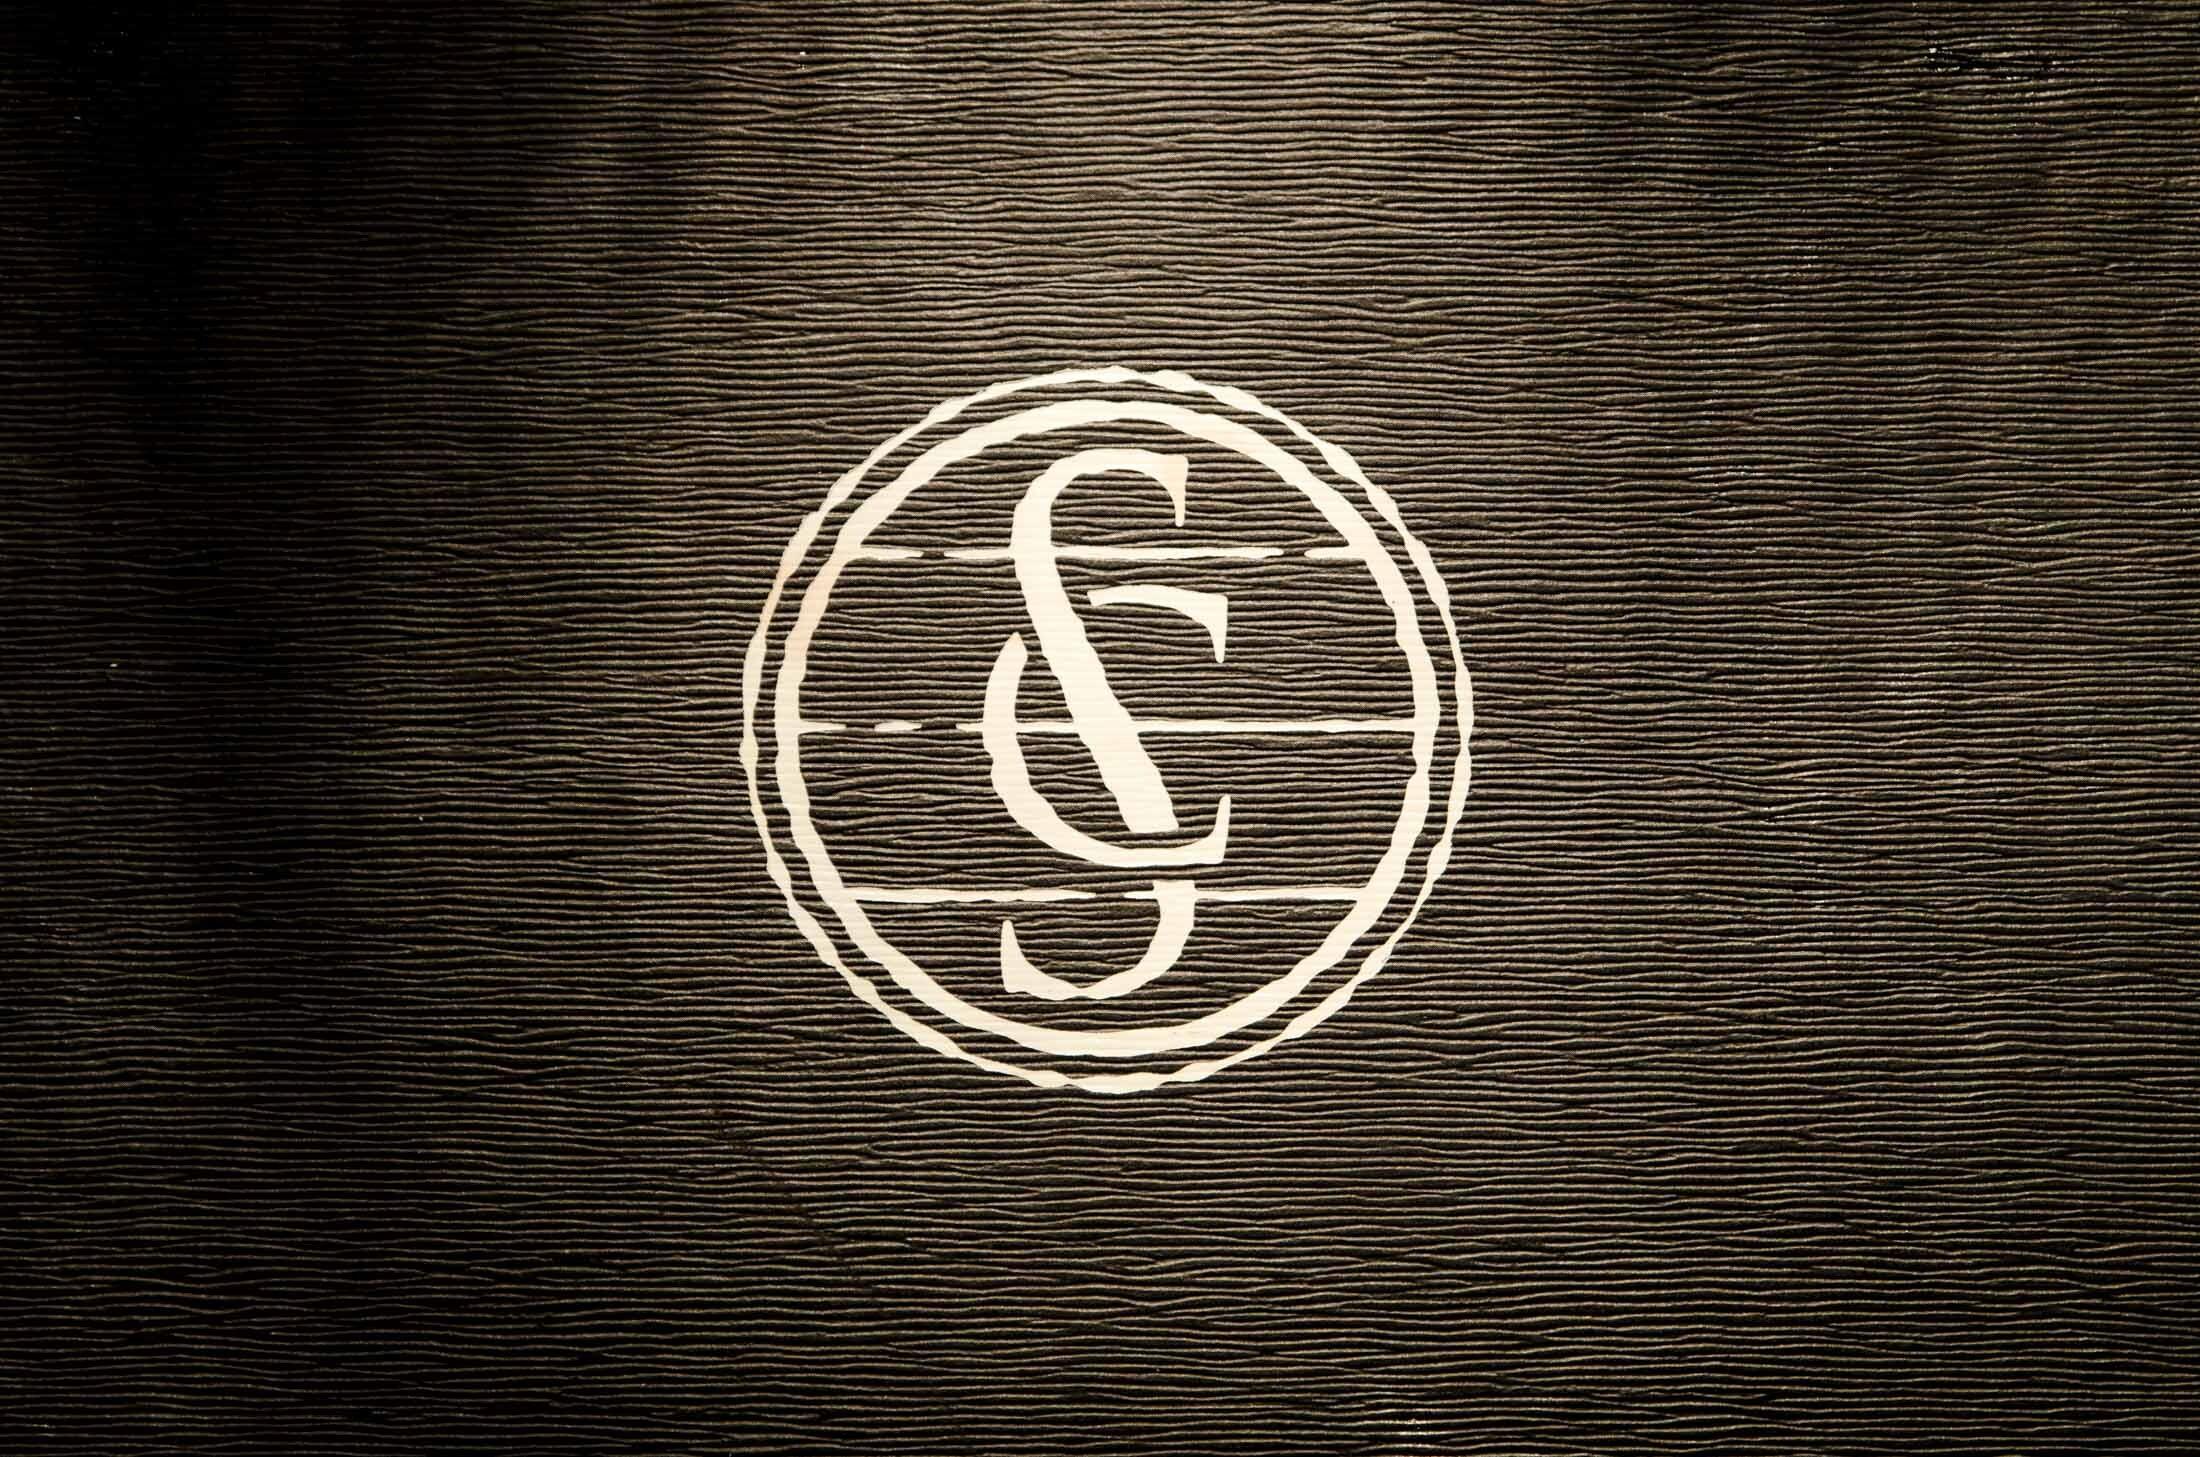 smugglers_cove_sanfrancisco_012.jpg